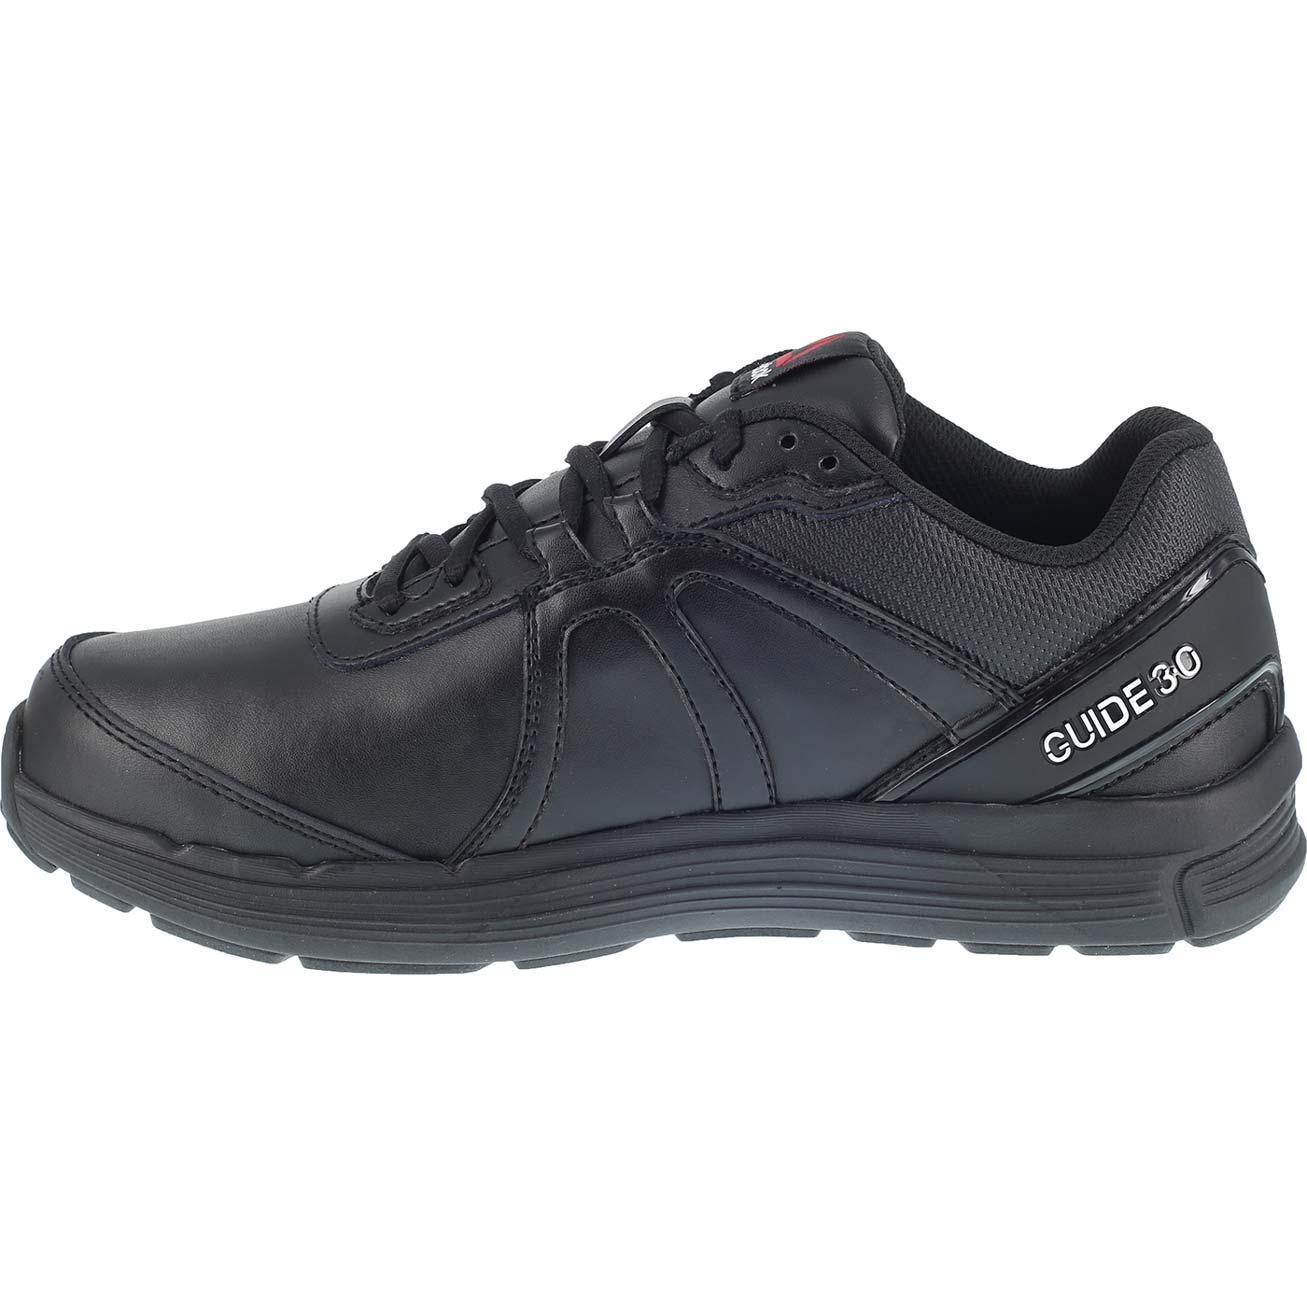 6d7abcde418 ... Guide Work Women s Electrical Hazard Slip-Resistant Work Shoe